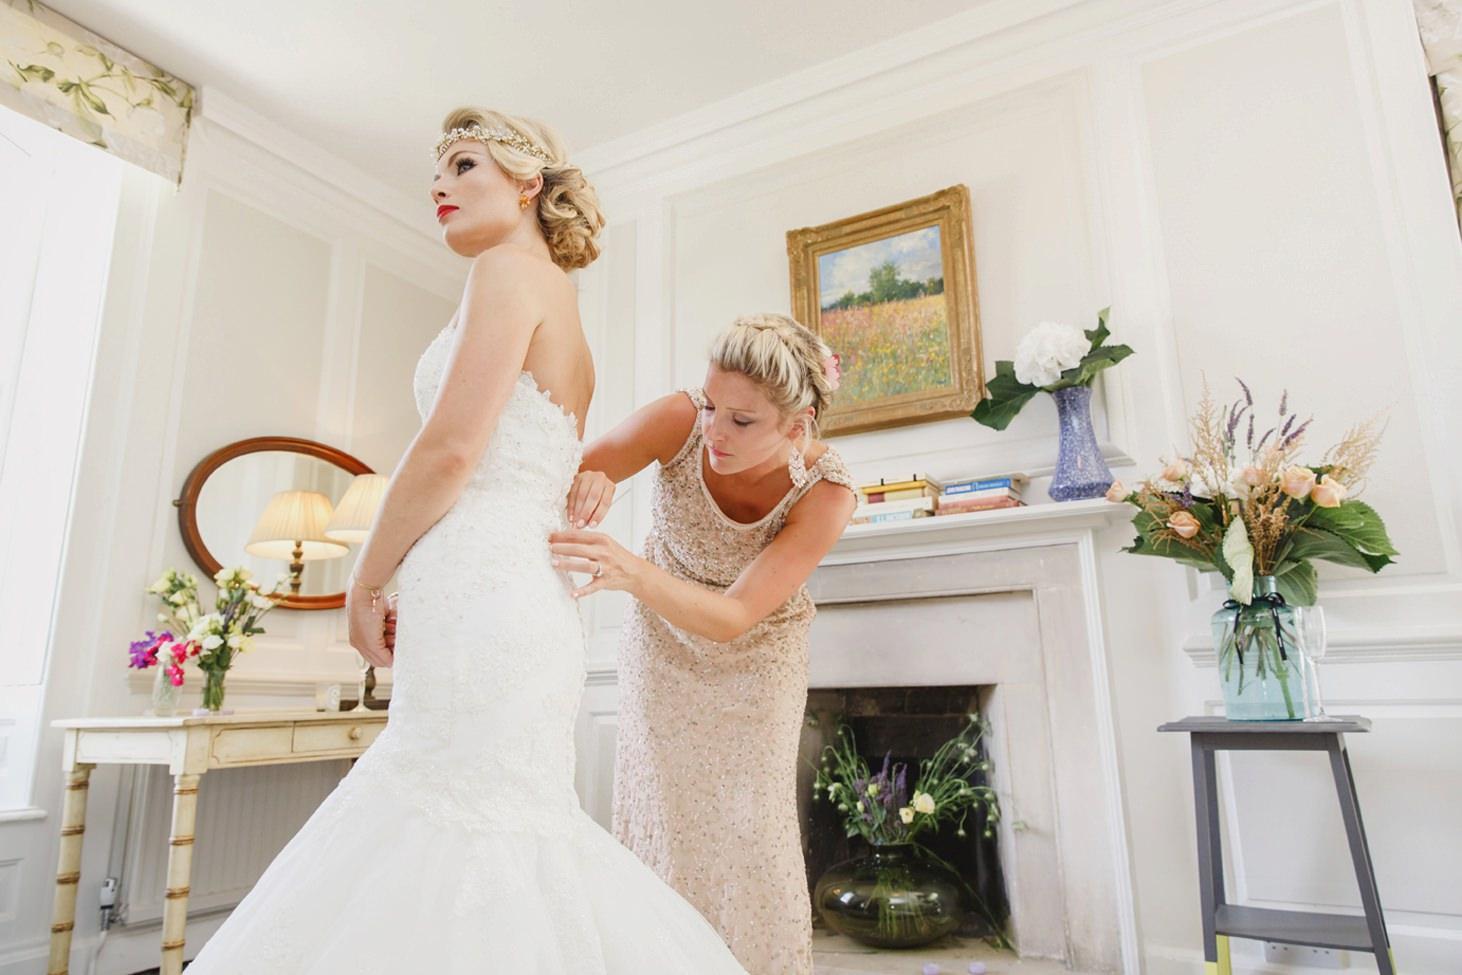 The Rectory Hotel Crudwell bridesmaids doing up wedding dress